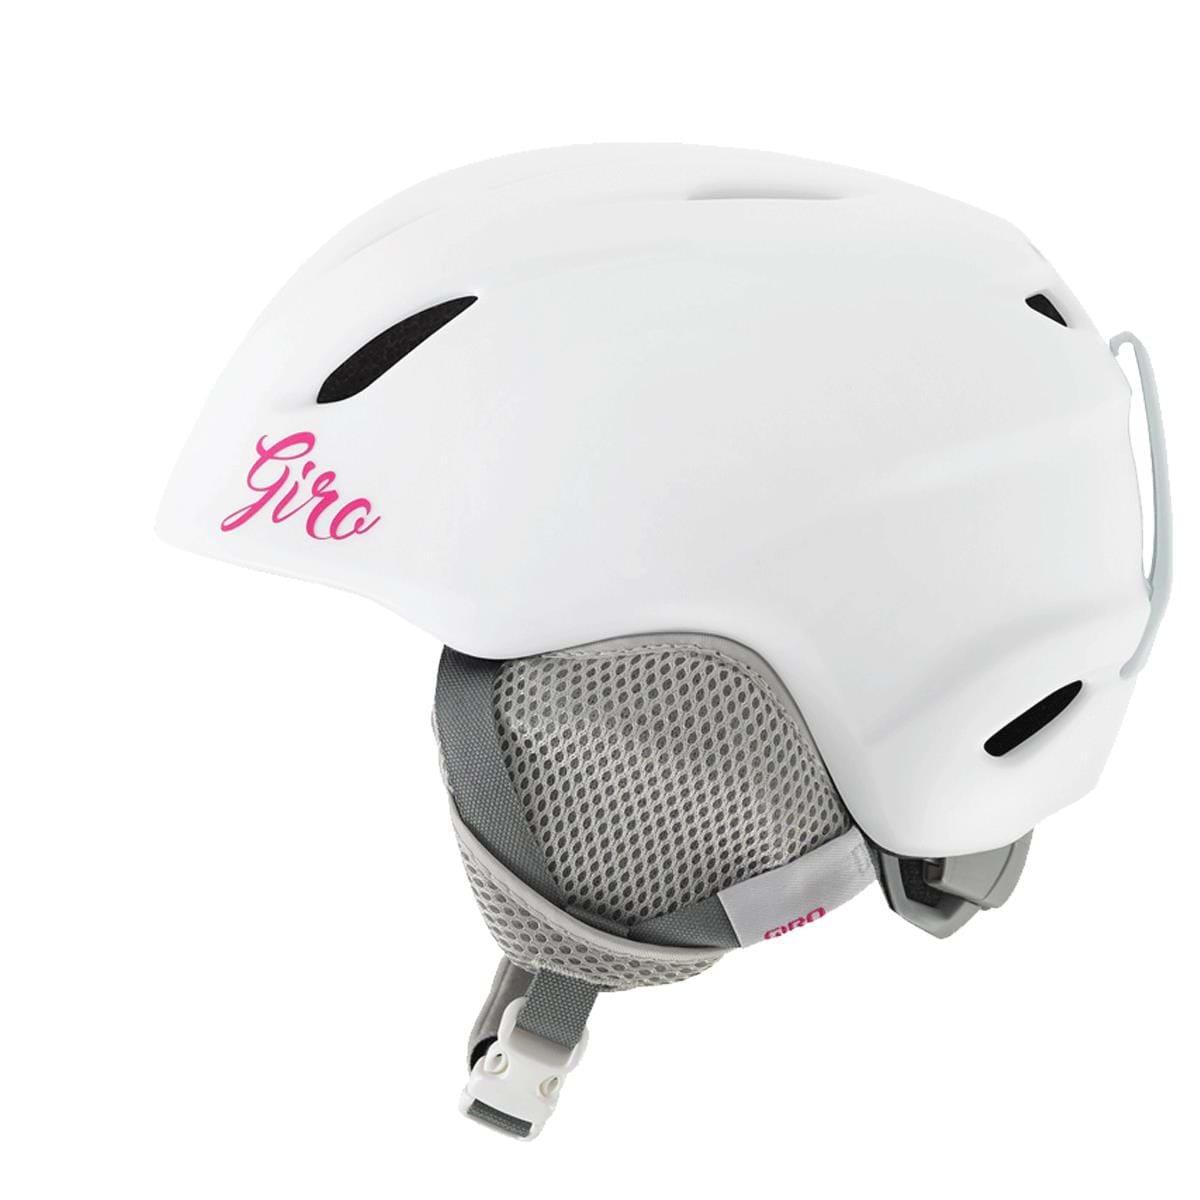 Launch Youth Snow Helmet